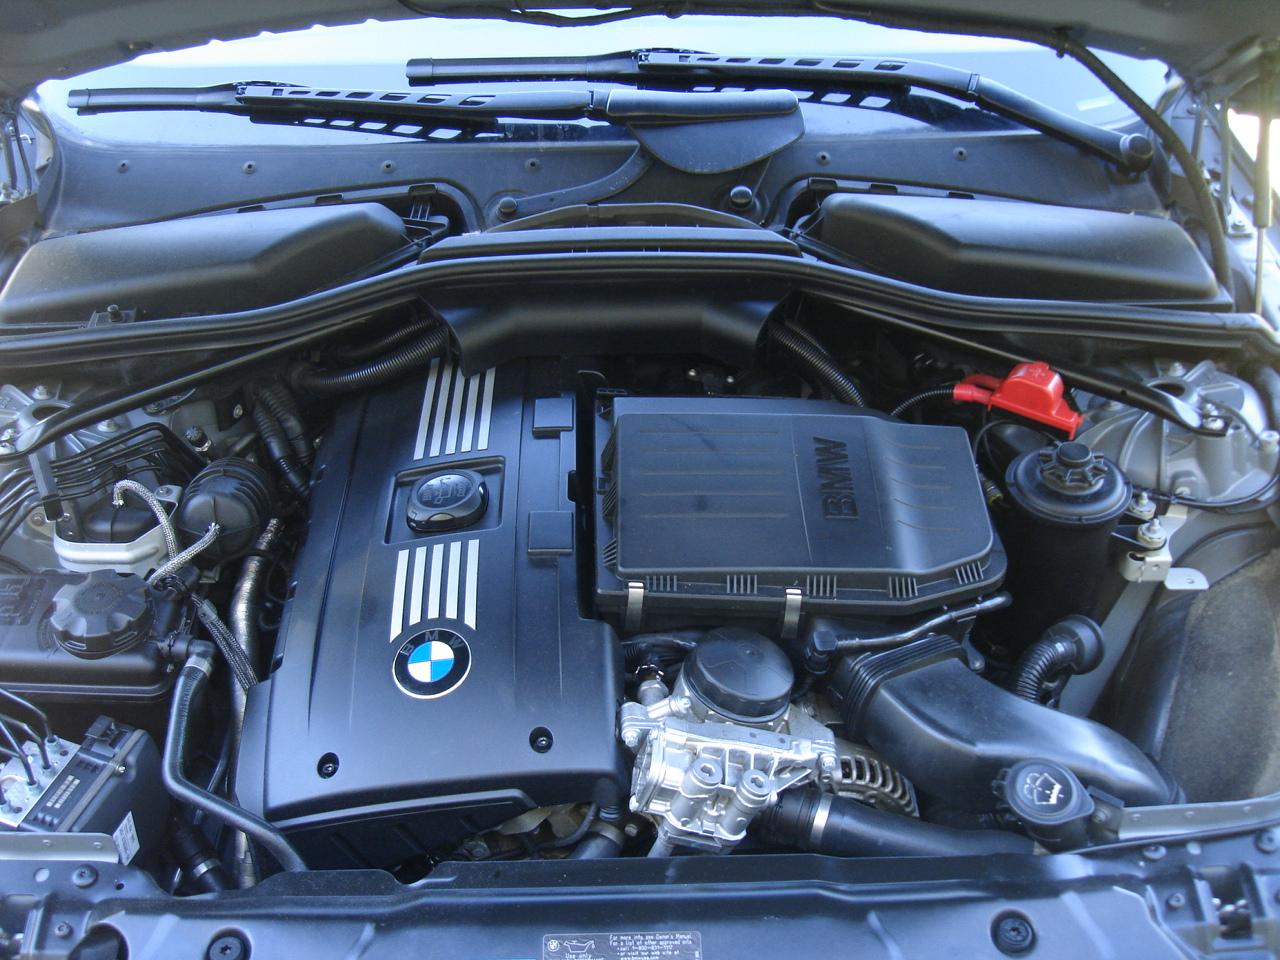 Bmw 745i Engine Diagram Porcelain Light Fixture Wiring 2009 BMW 535I XDRIVE 043